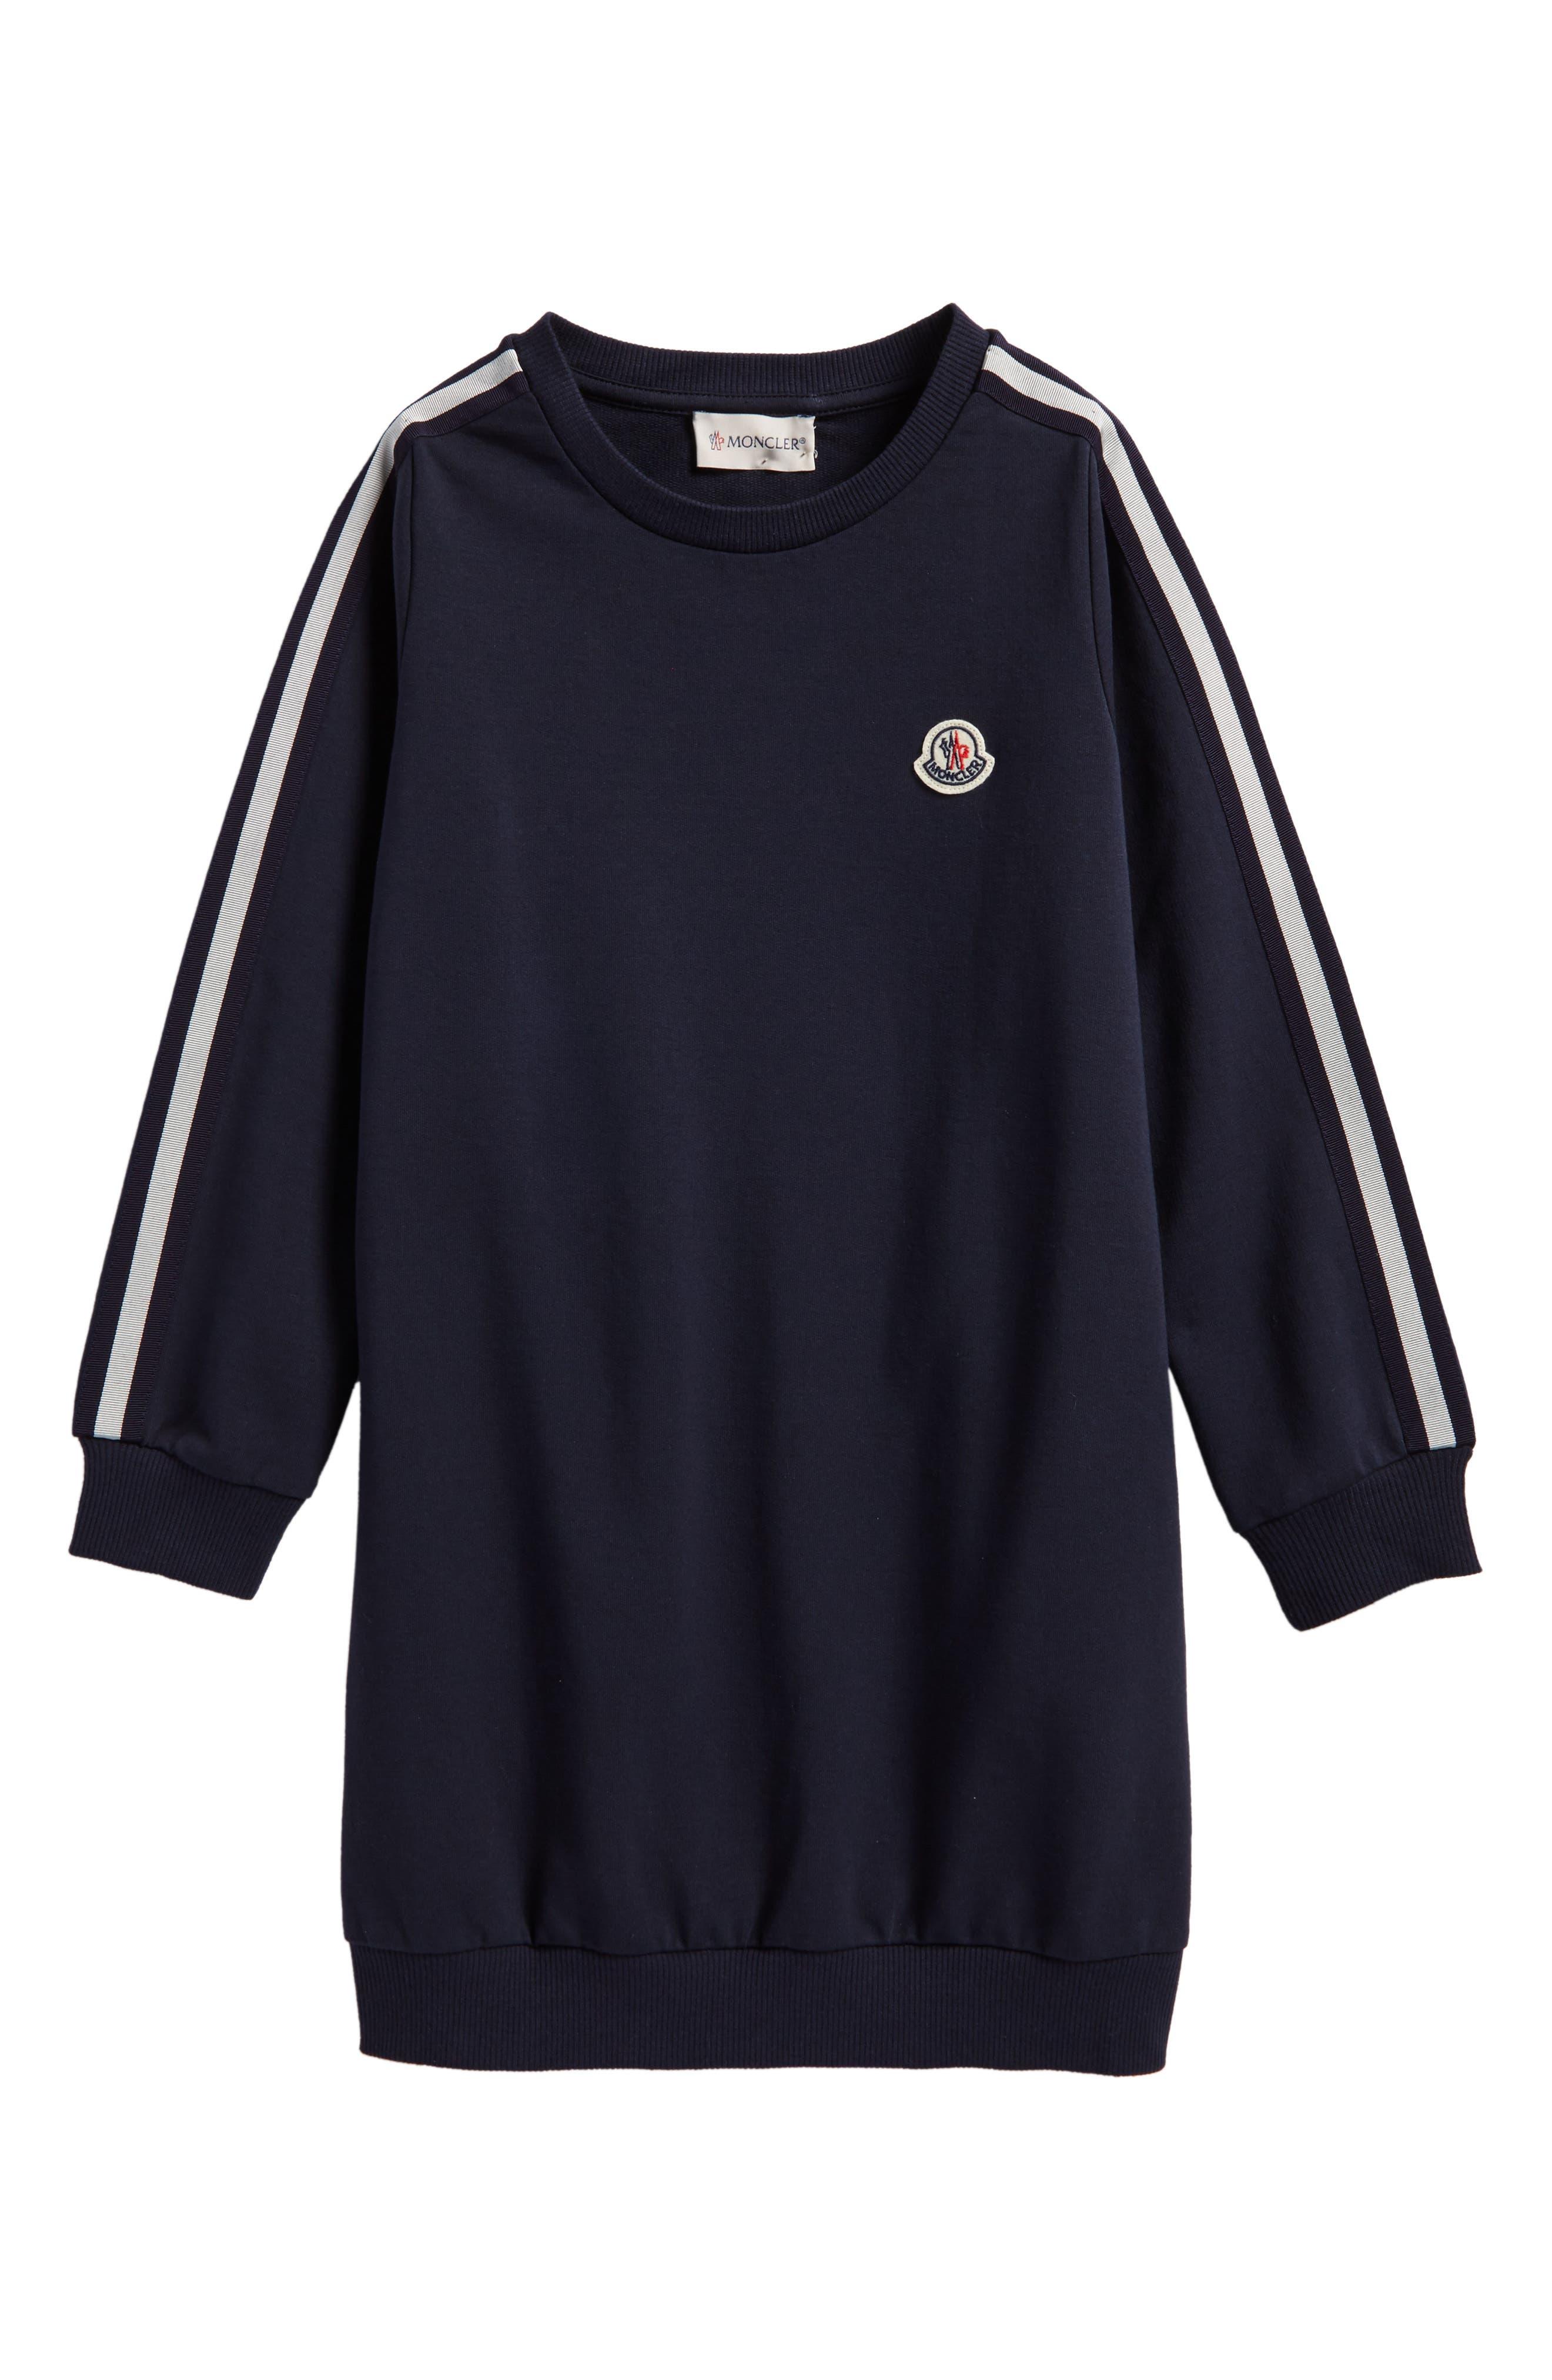 Sweatshirt Dress,                         Main,                         color, Navy